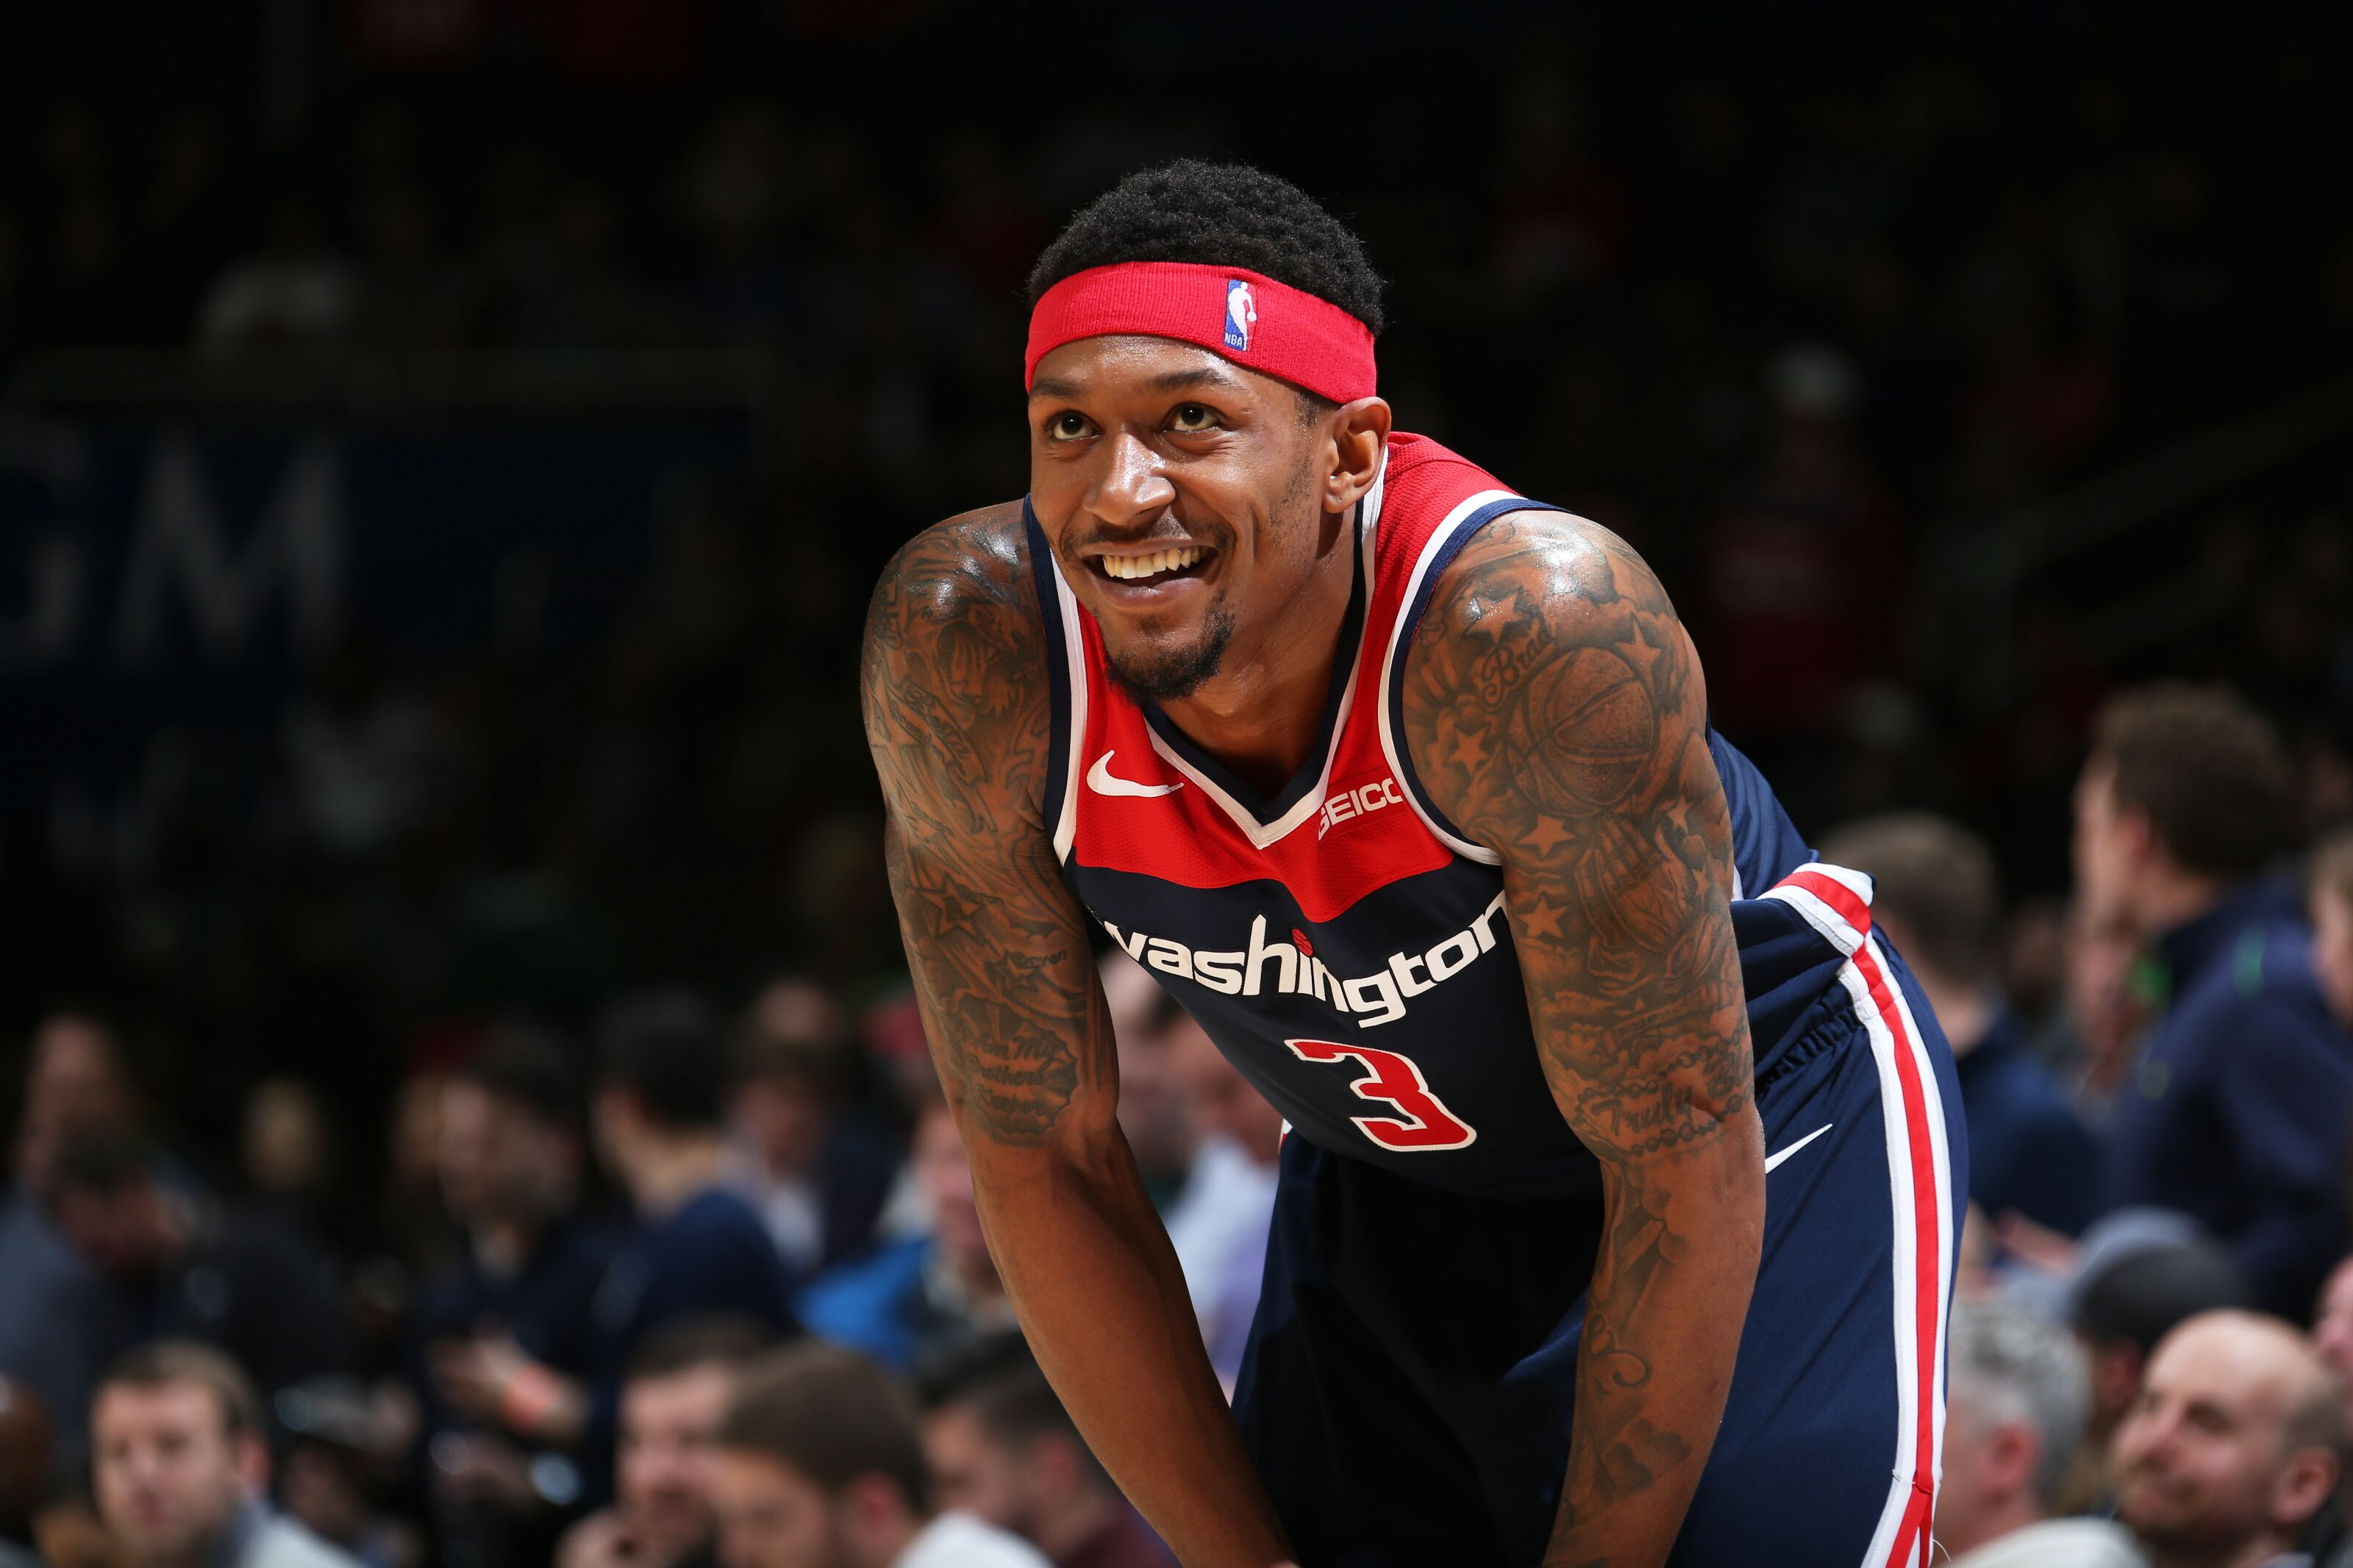 Washington Wizards: Rumored Extension for Bradley Beal Makes No Sense